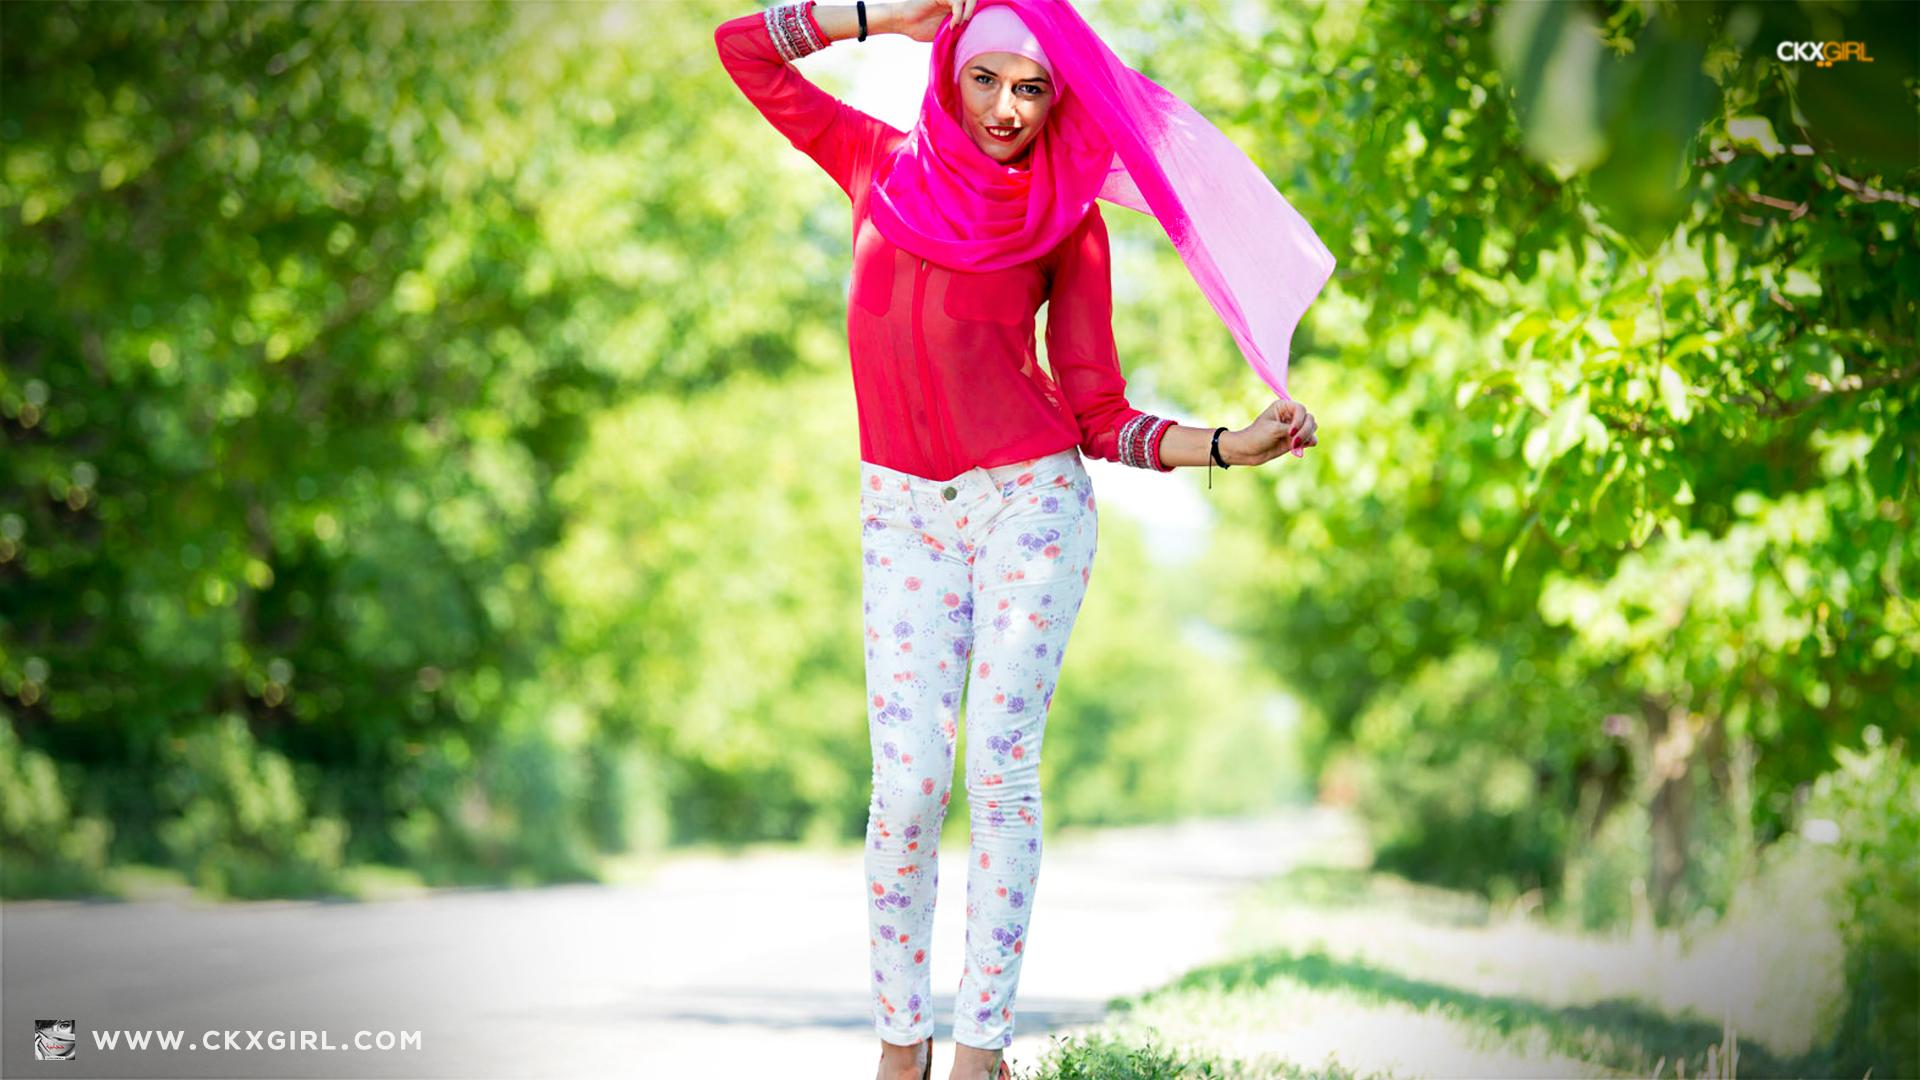 Zeiramuslim  Cokegirlx  Muslim Hijab Girls  Live Sex -2678